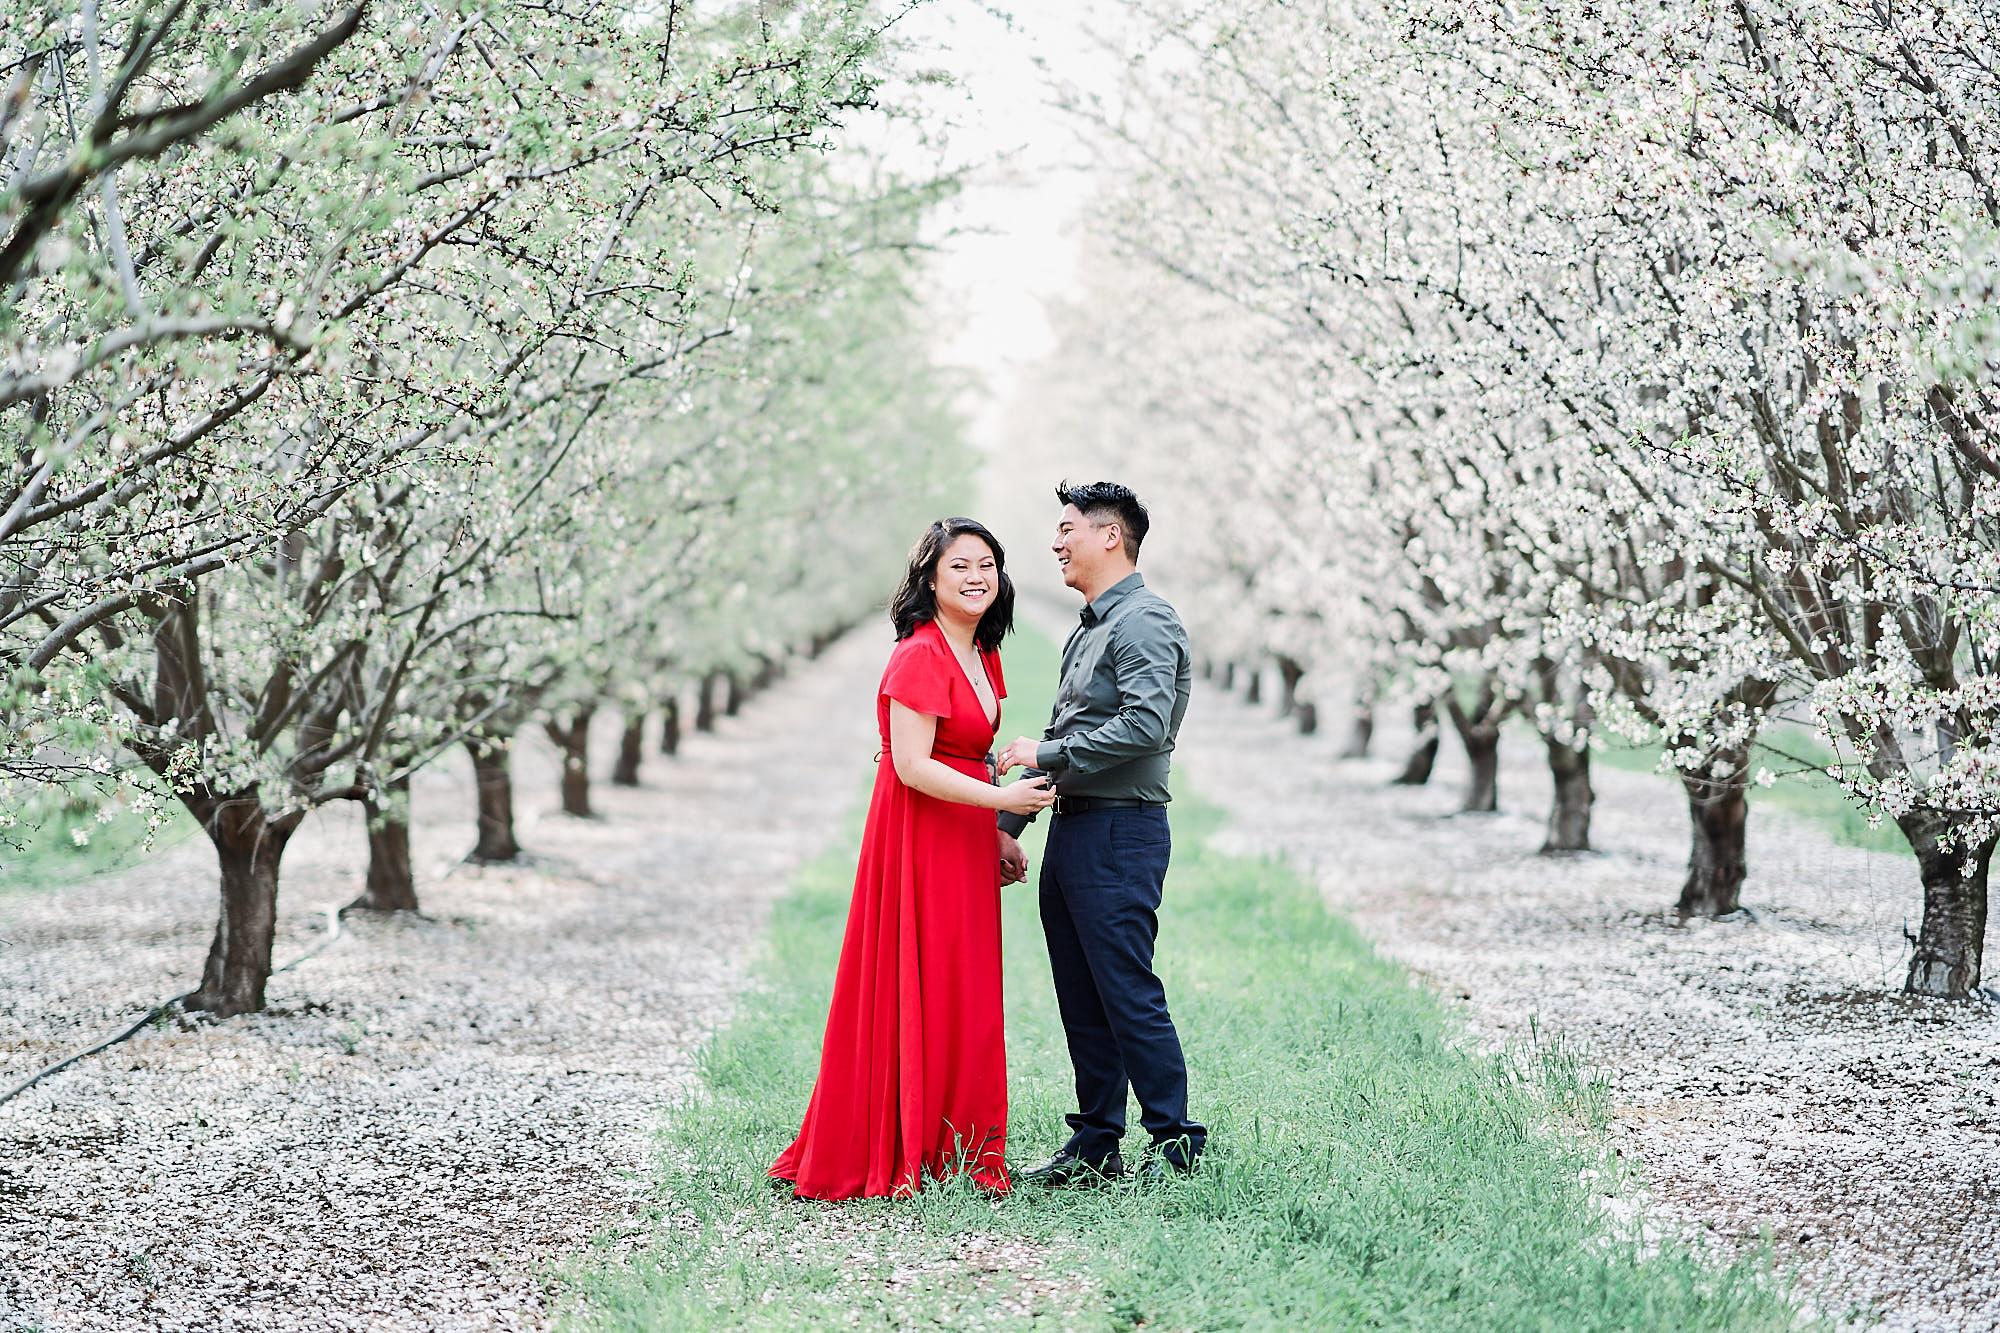 Asian Couples Photos At Almond Orchards California